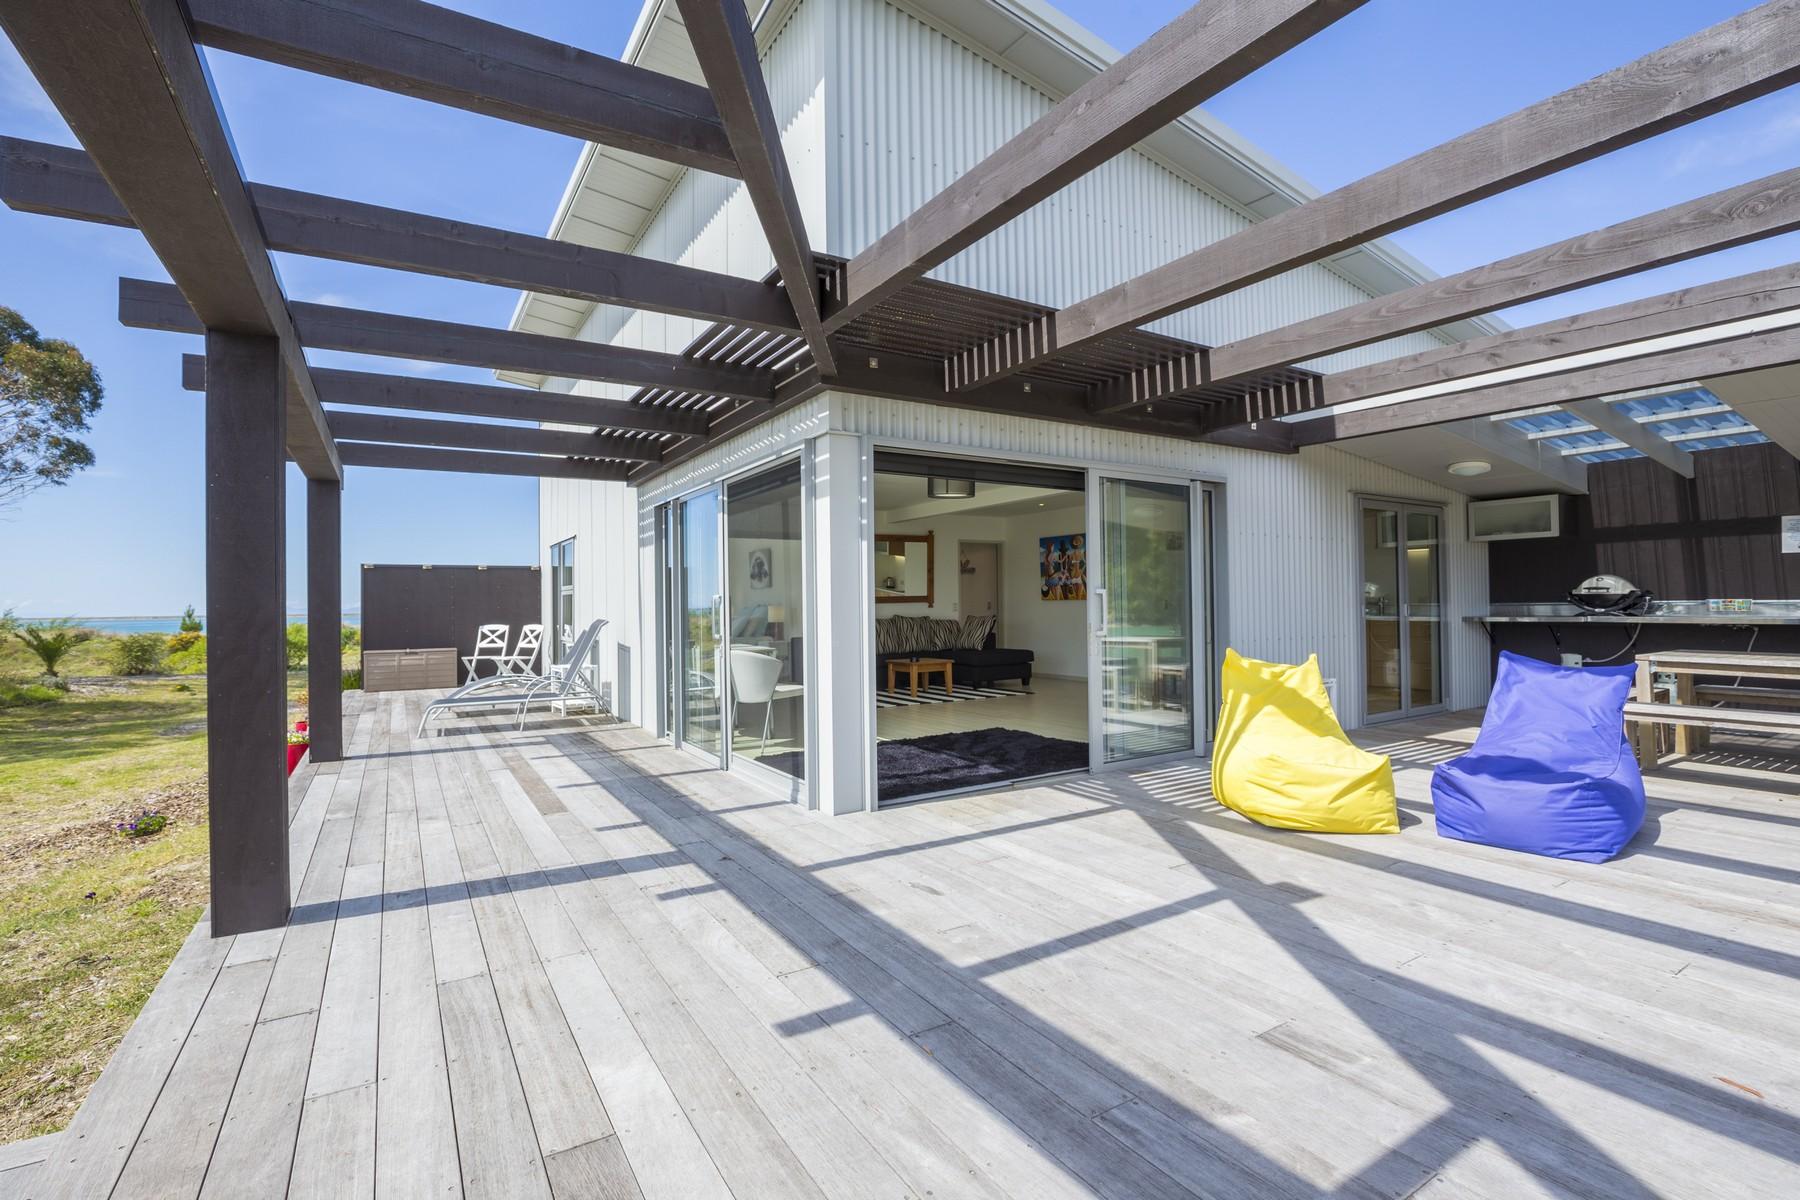 Other Residential Homes 为 销售 在 9 Jackett Island Motueka 纳尔逊, 纳尔逊 7173 新西兰